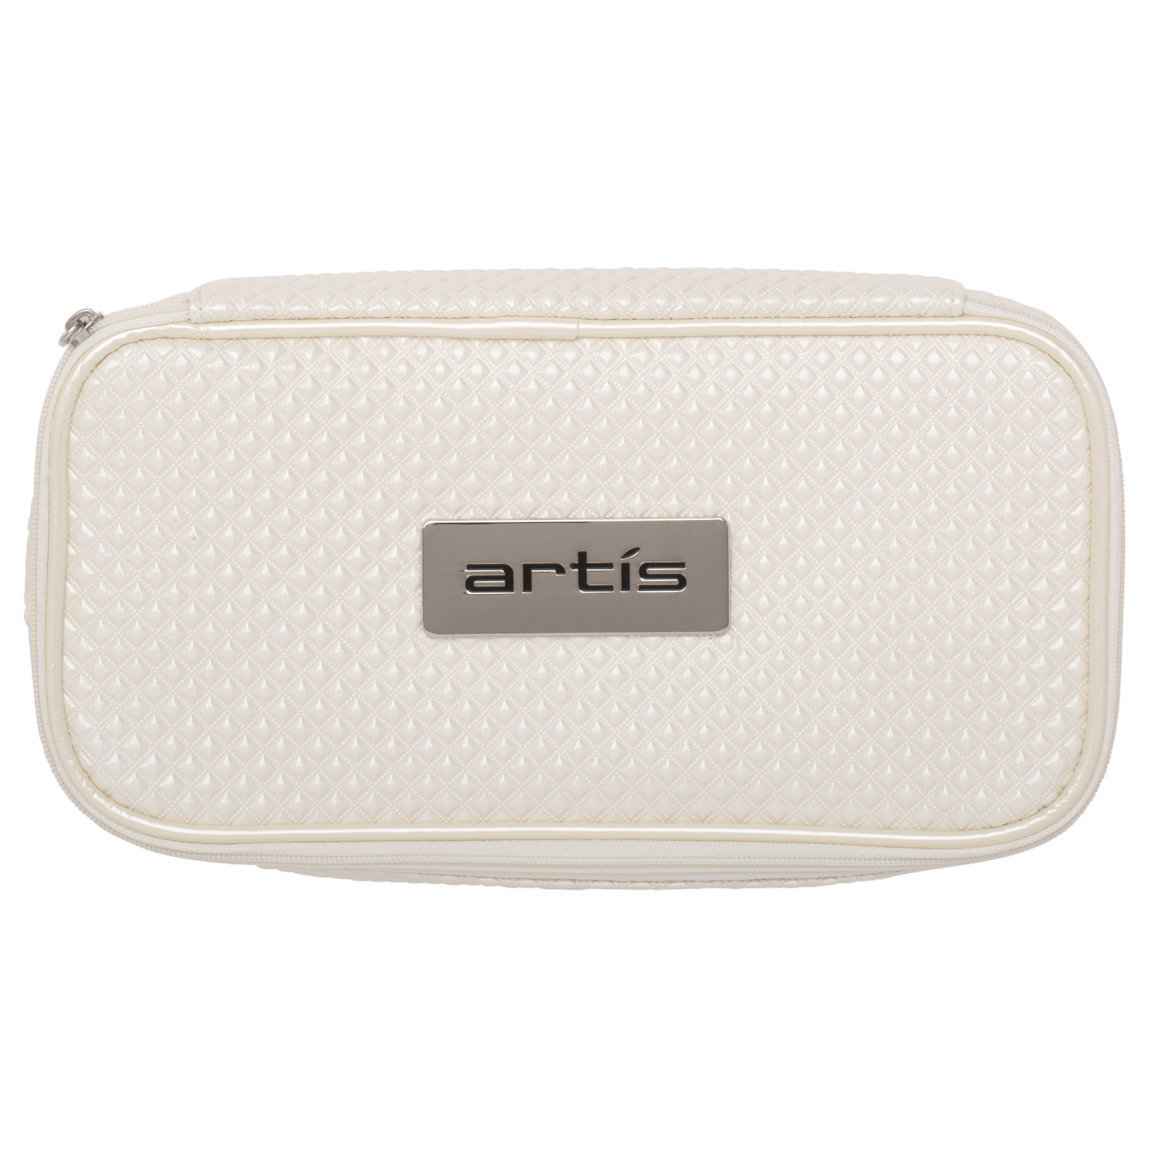 Artis Zippered Brush Case alternative view 1 - product swatch.